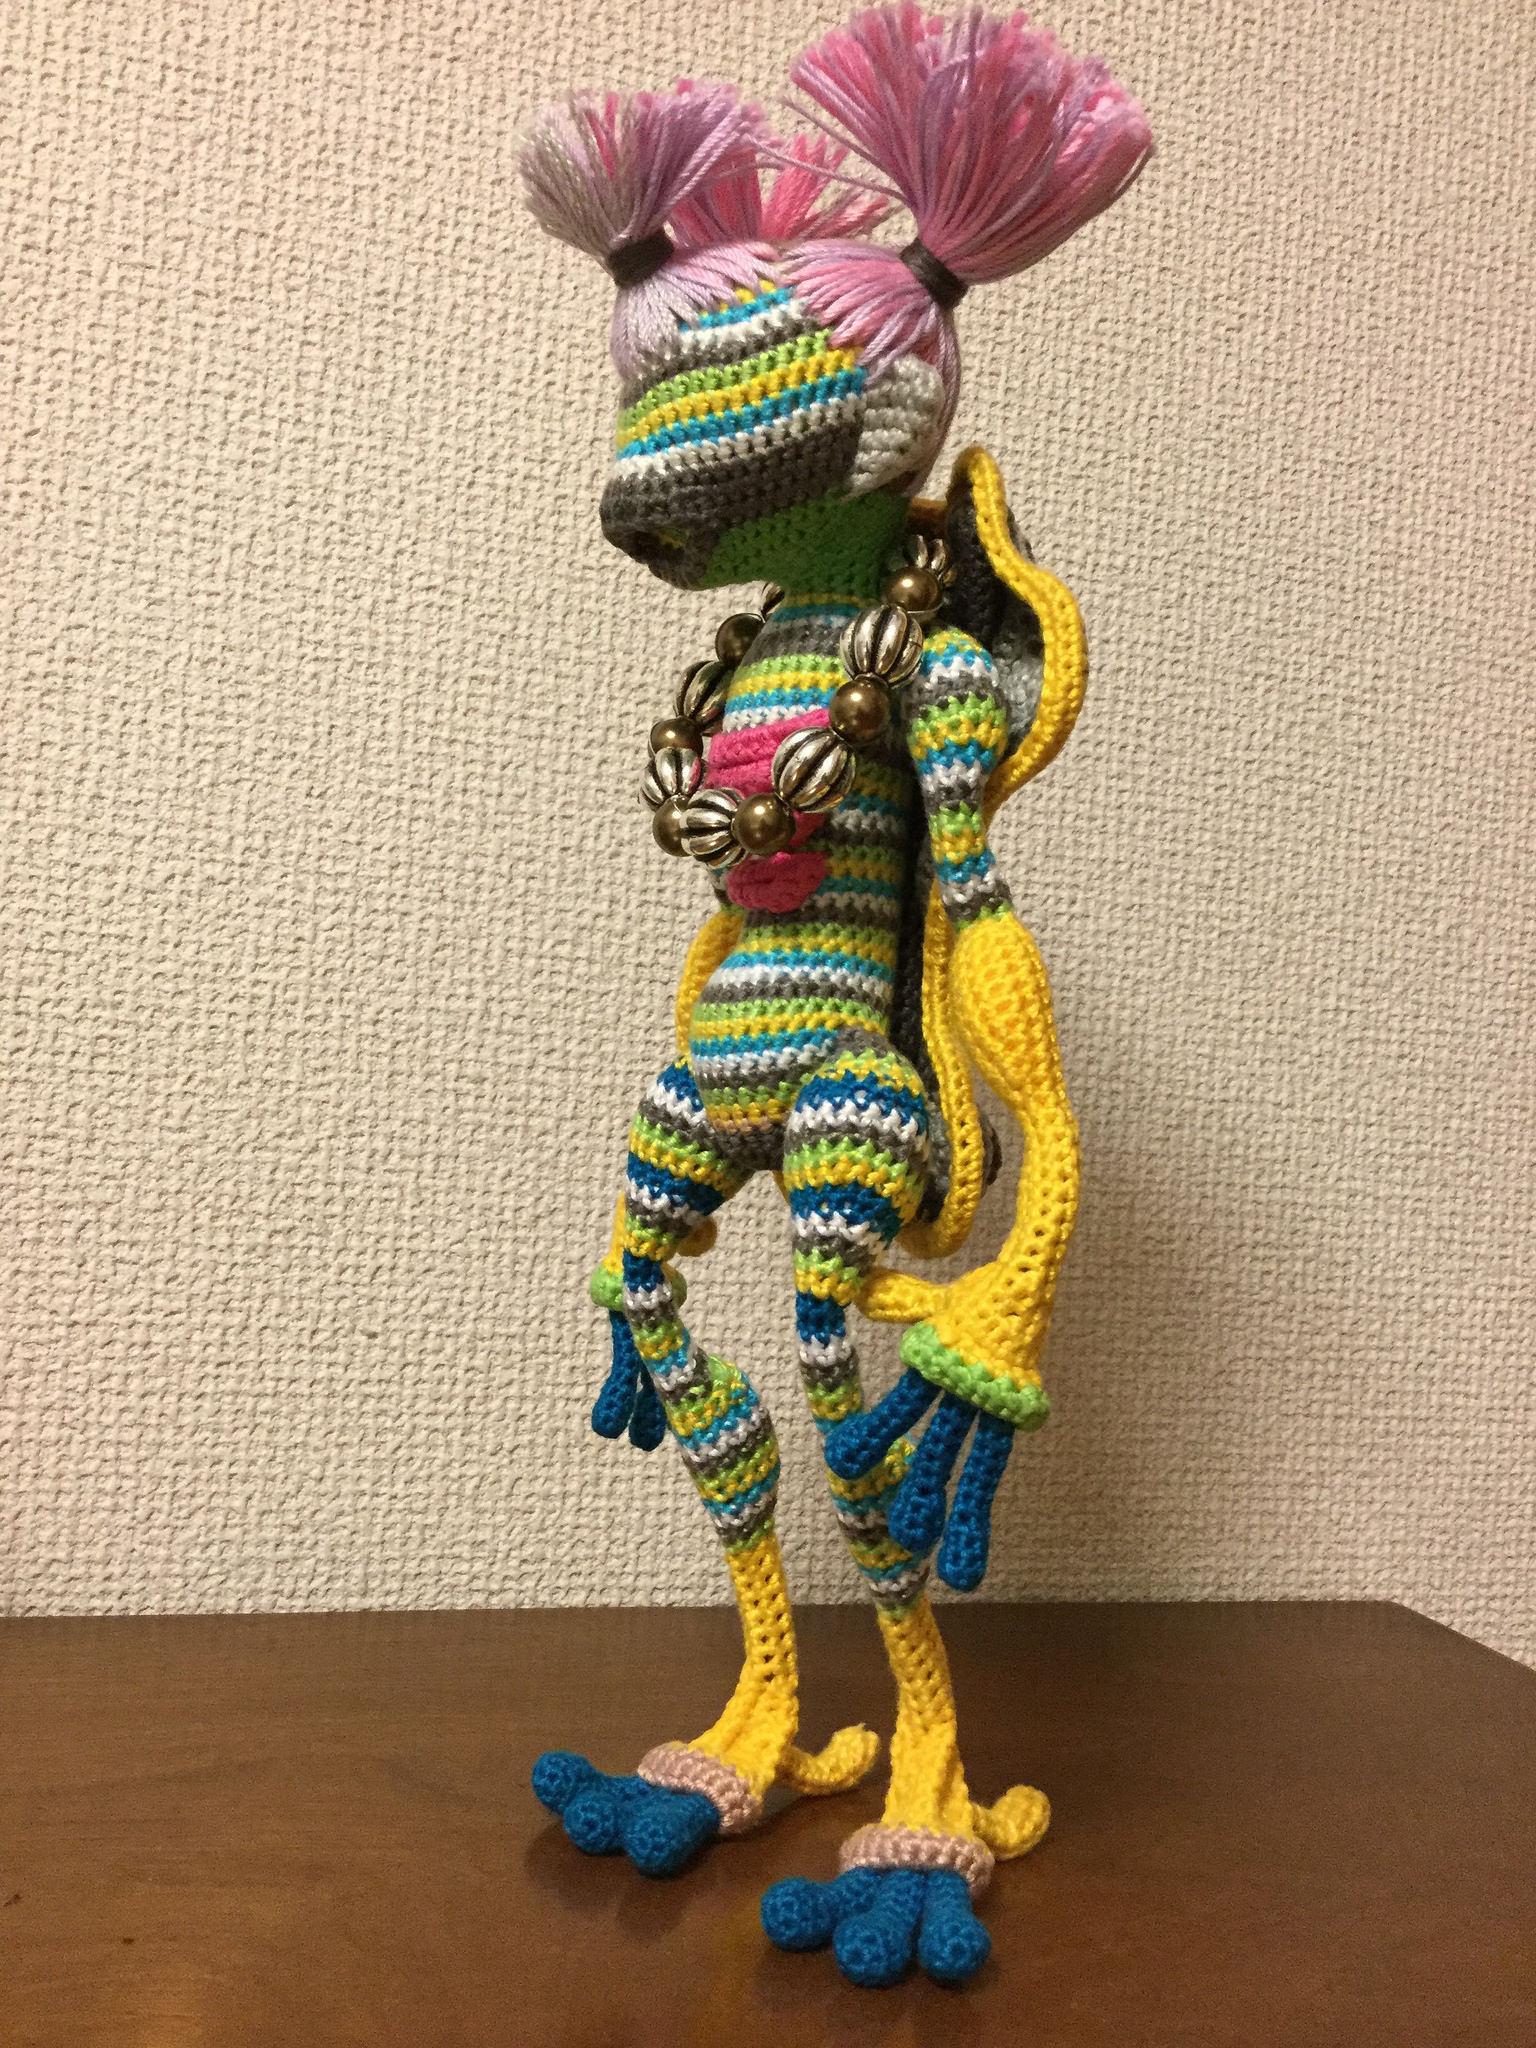 'Pink Pigtails' Amigurumi Doll Sculpture Crocheted By Makoto Kitazawa